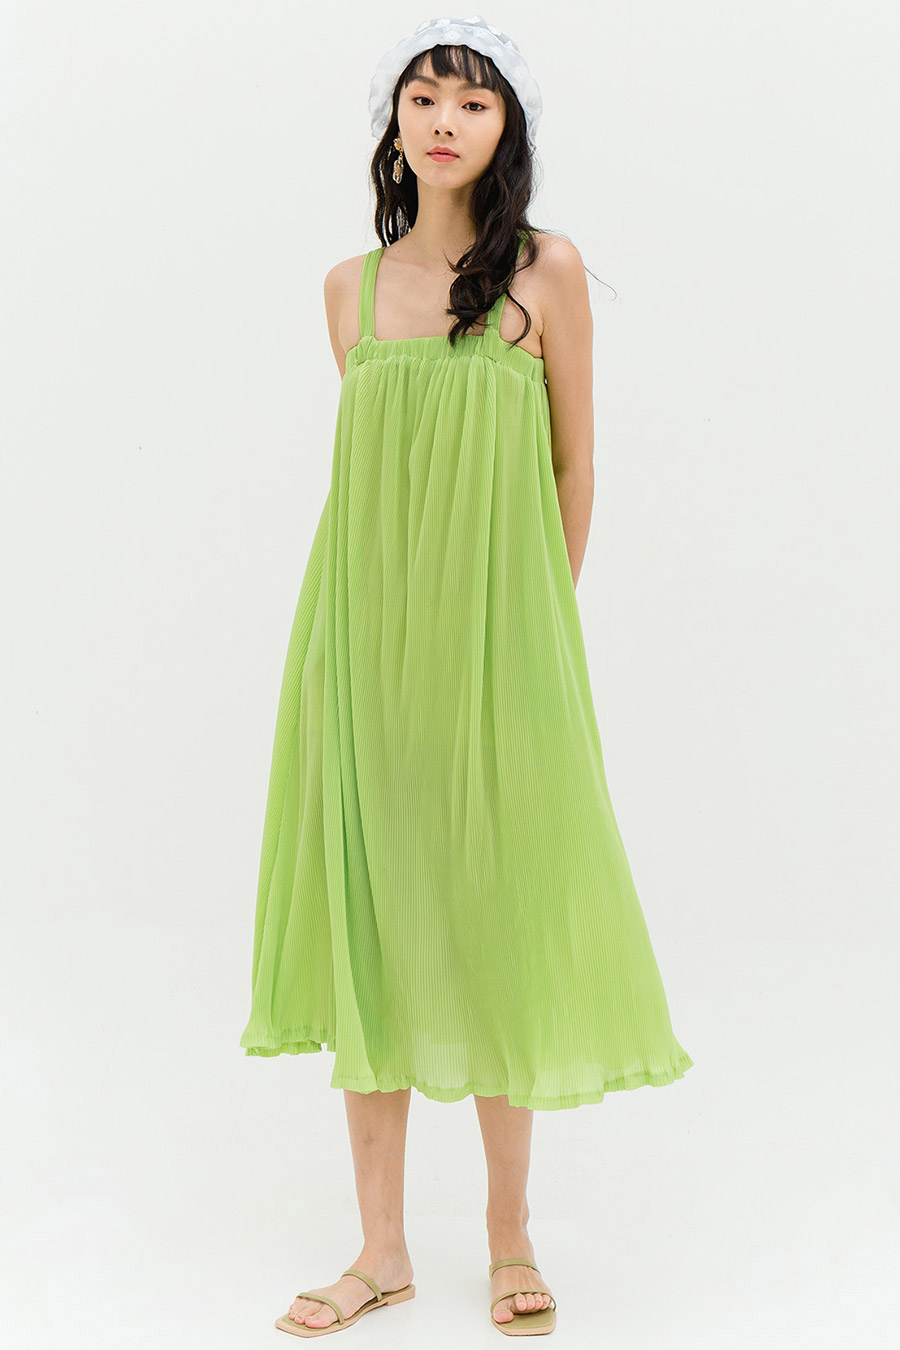 ANTONIA DRESS - CYPRESS [BY MODPARADE]